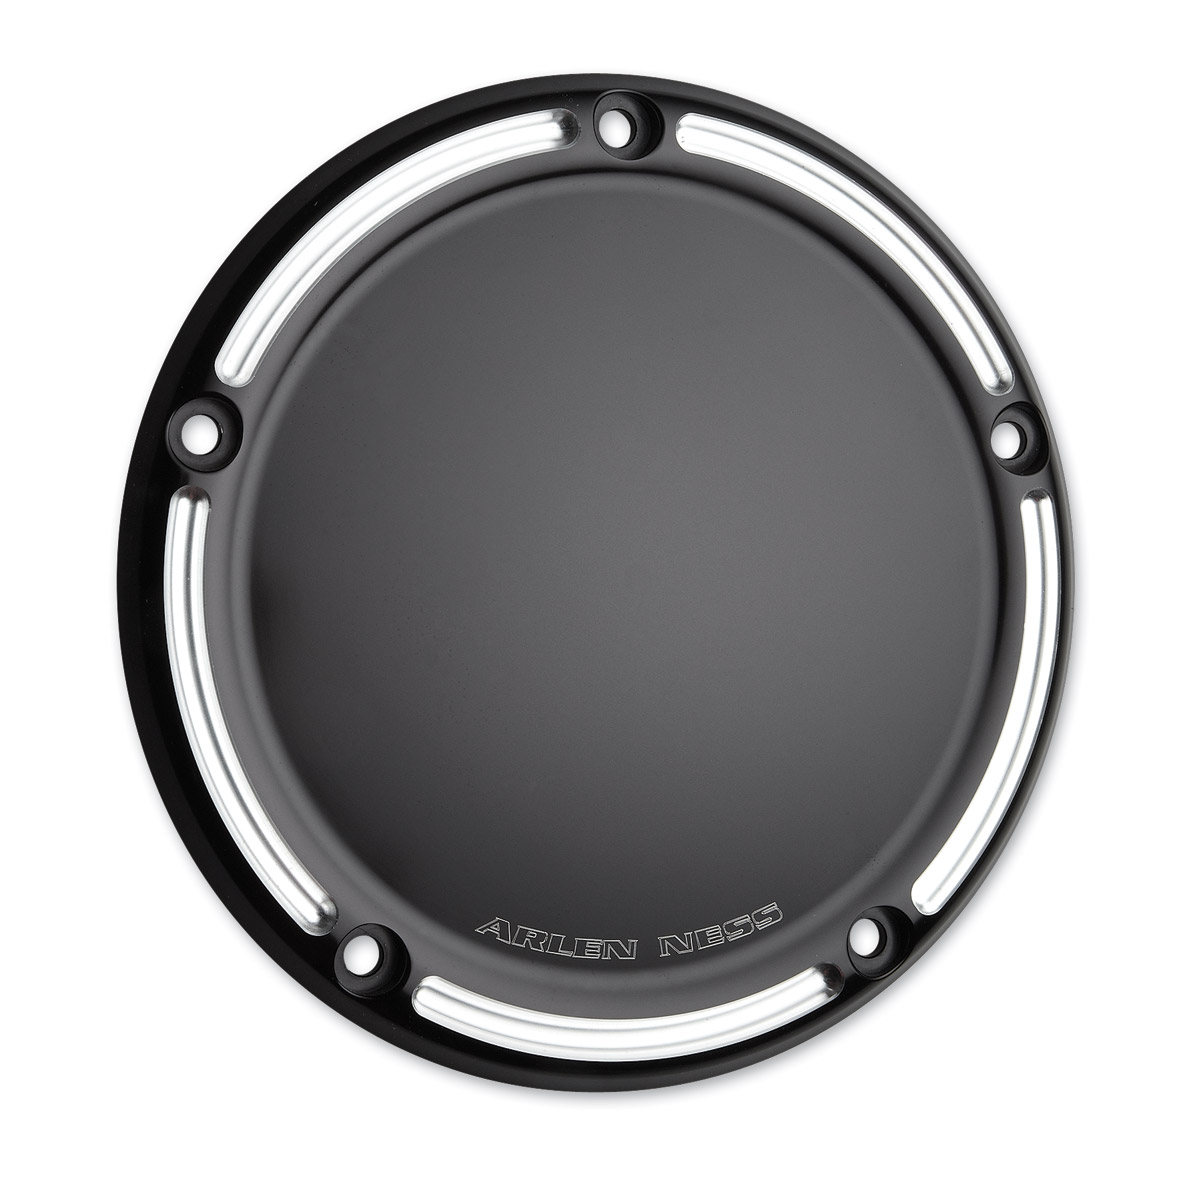 Arlen Ness 03-493 Black Slot Track Derby Cover For Harley